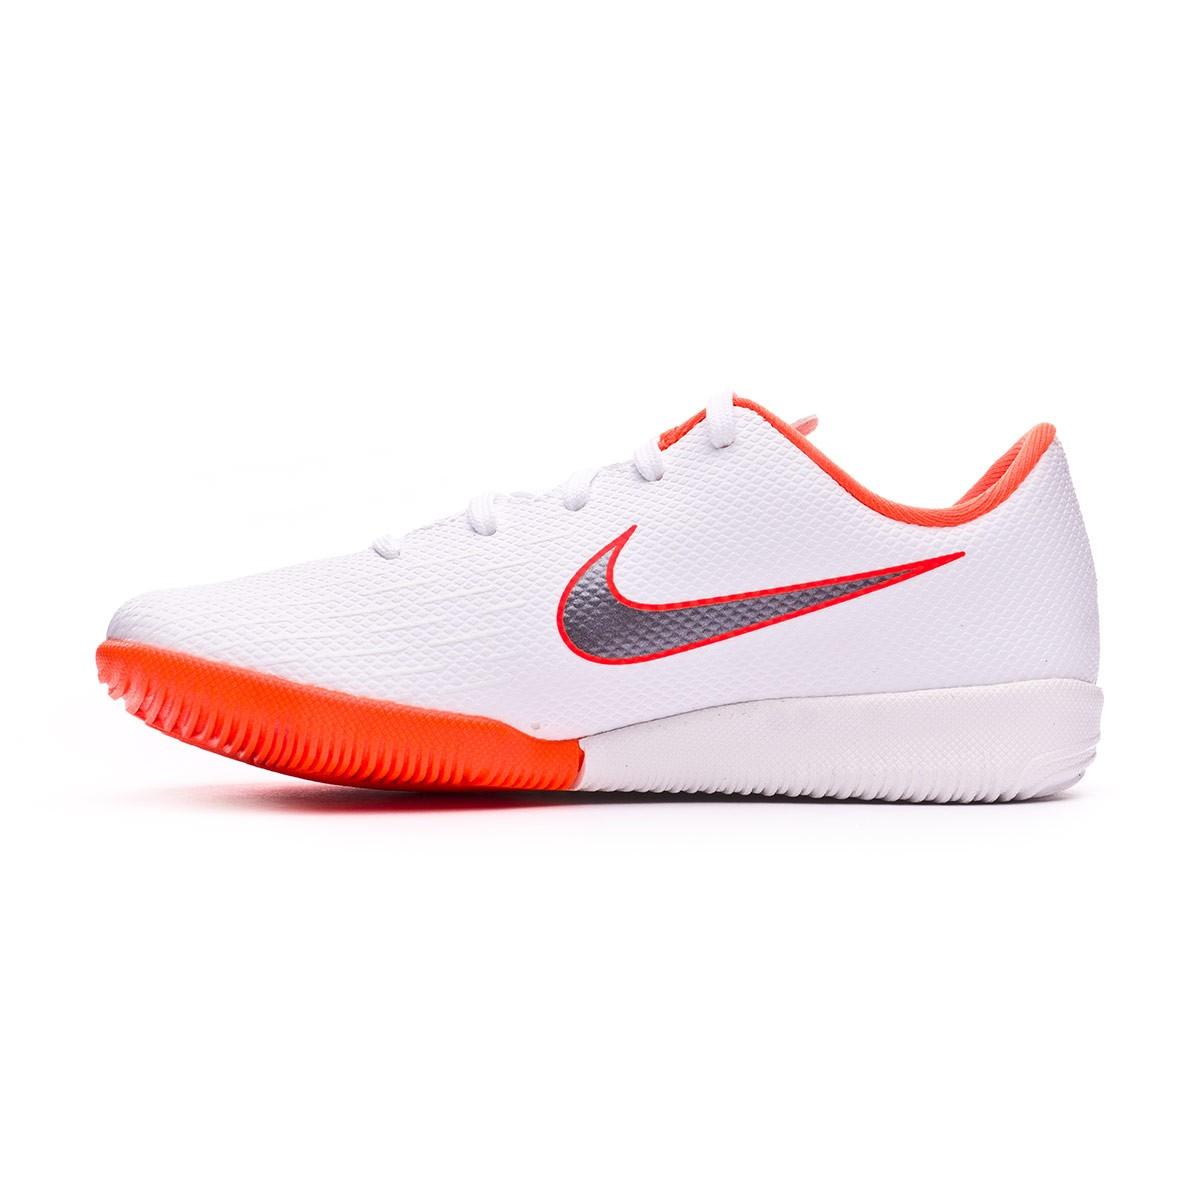 45c396b4e Futsal Boot Nike Kids Mercurial VaporX XII Academy PS IC White-Metallic  cool grey-Total orange - Football store Fútbol Emotion